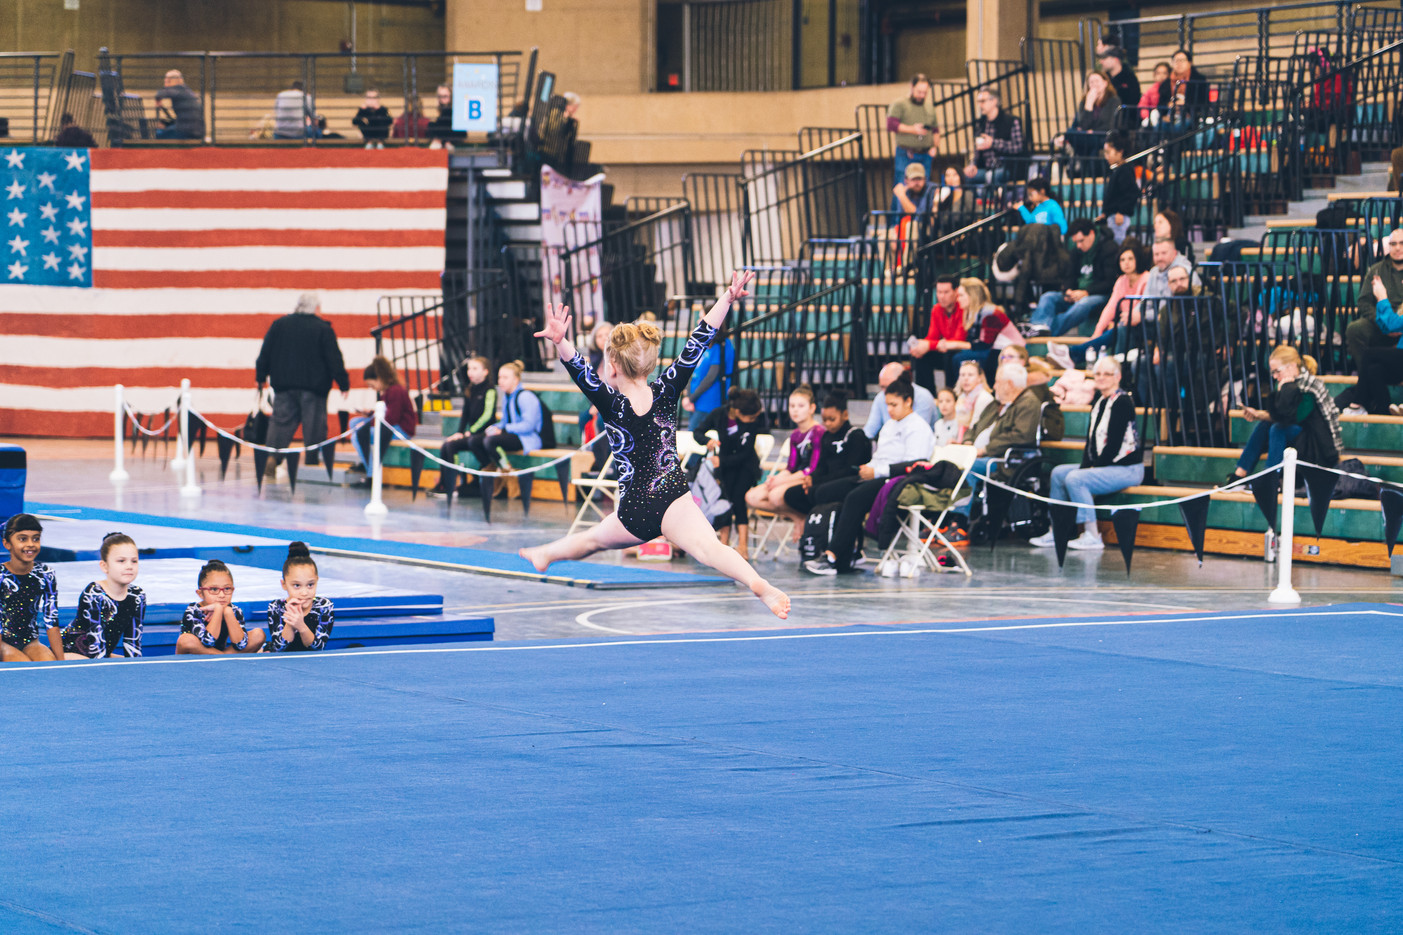 Industry Gymnastics